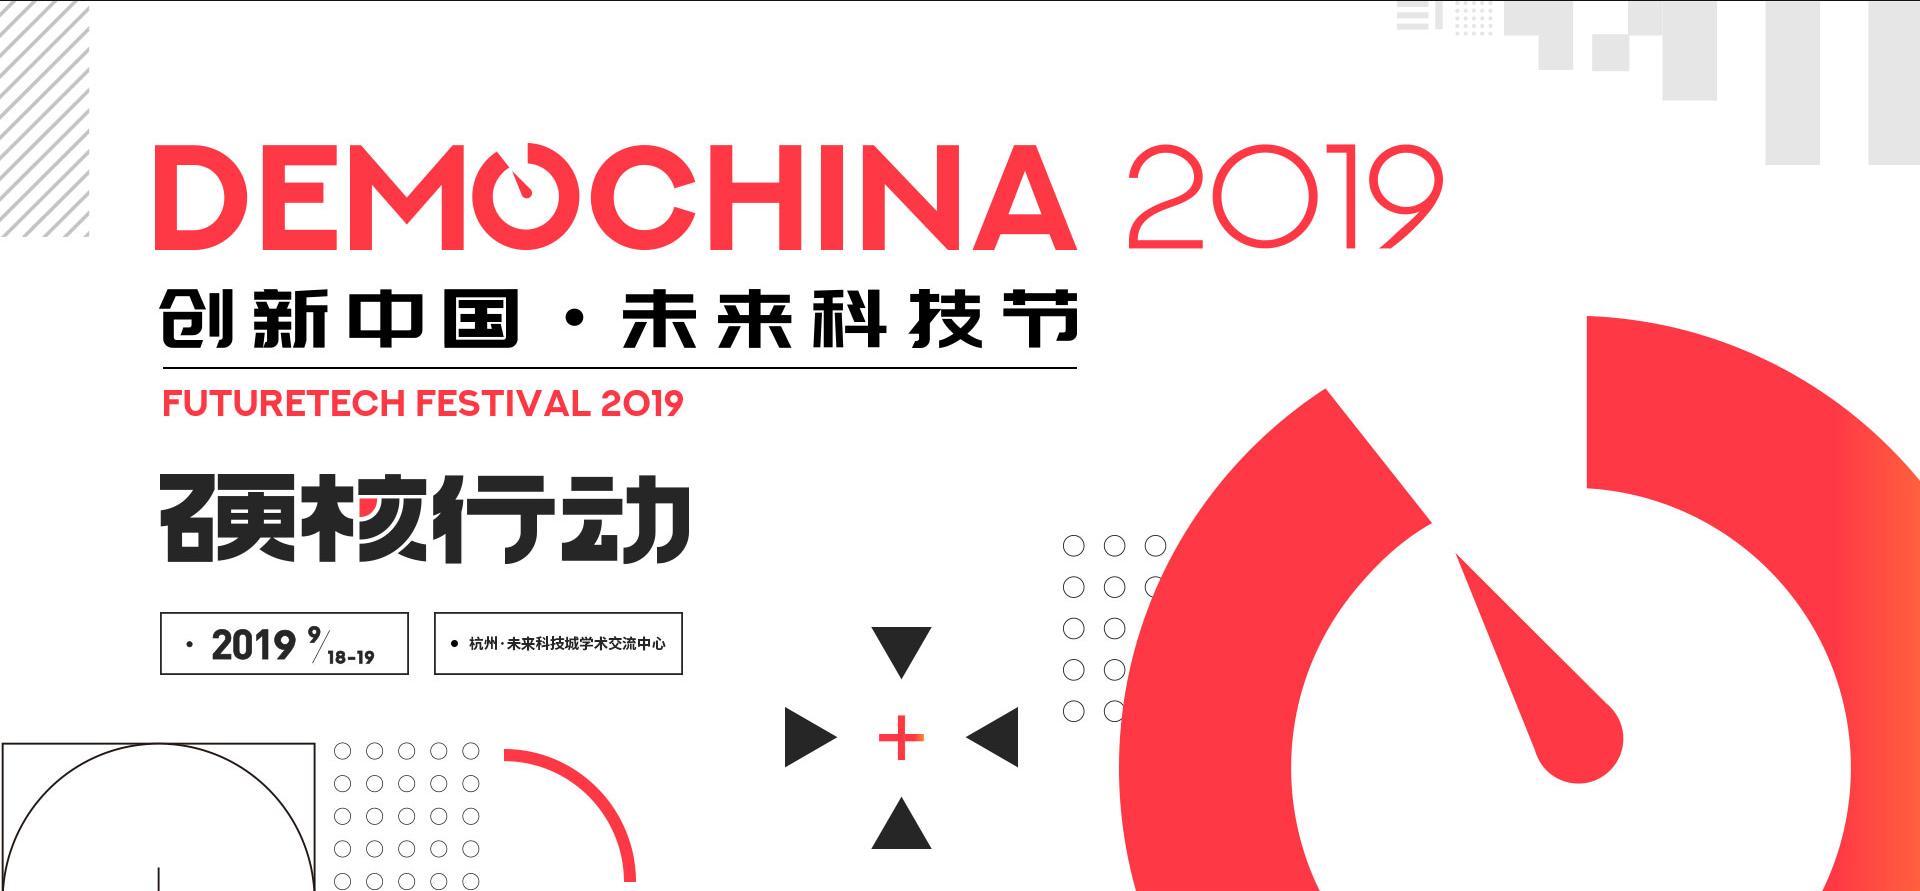 2019 DEMO CHINA 创新中国未来科技节